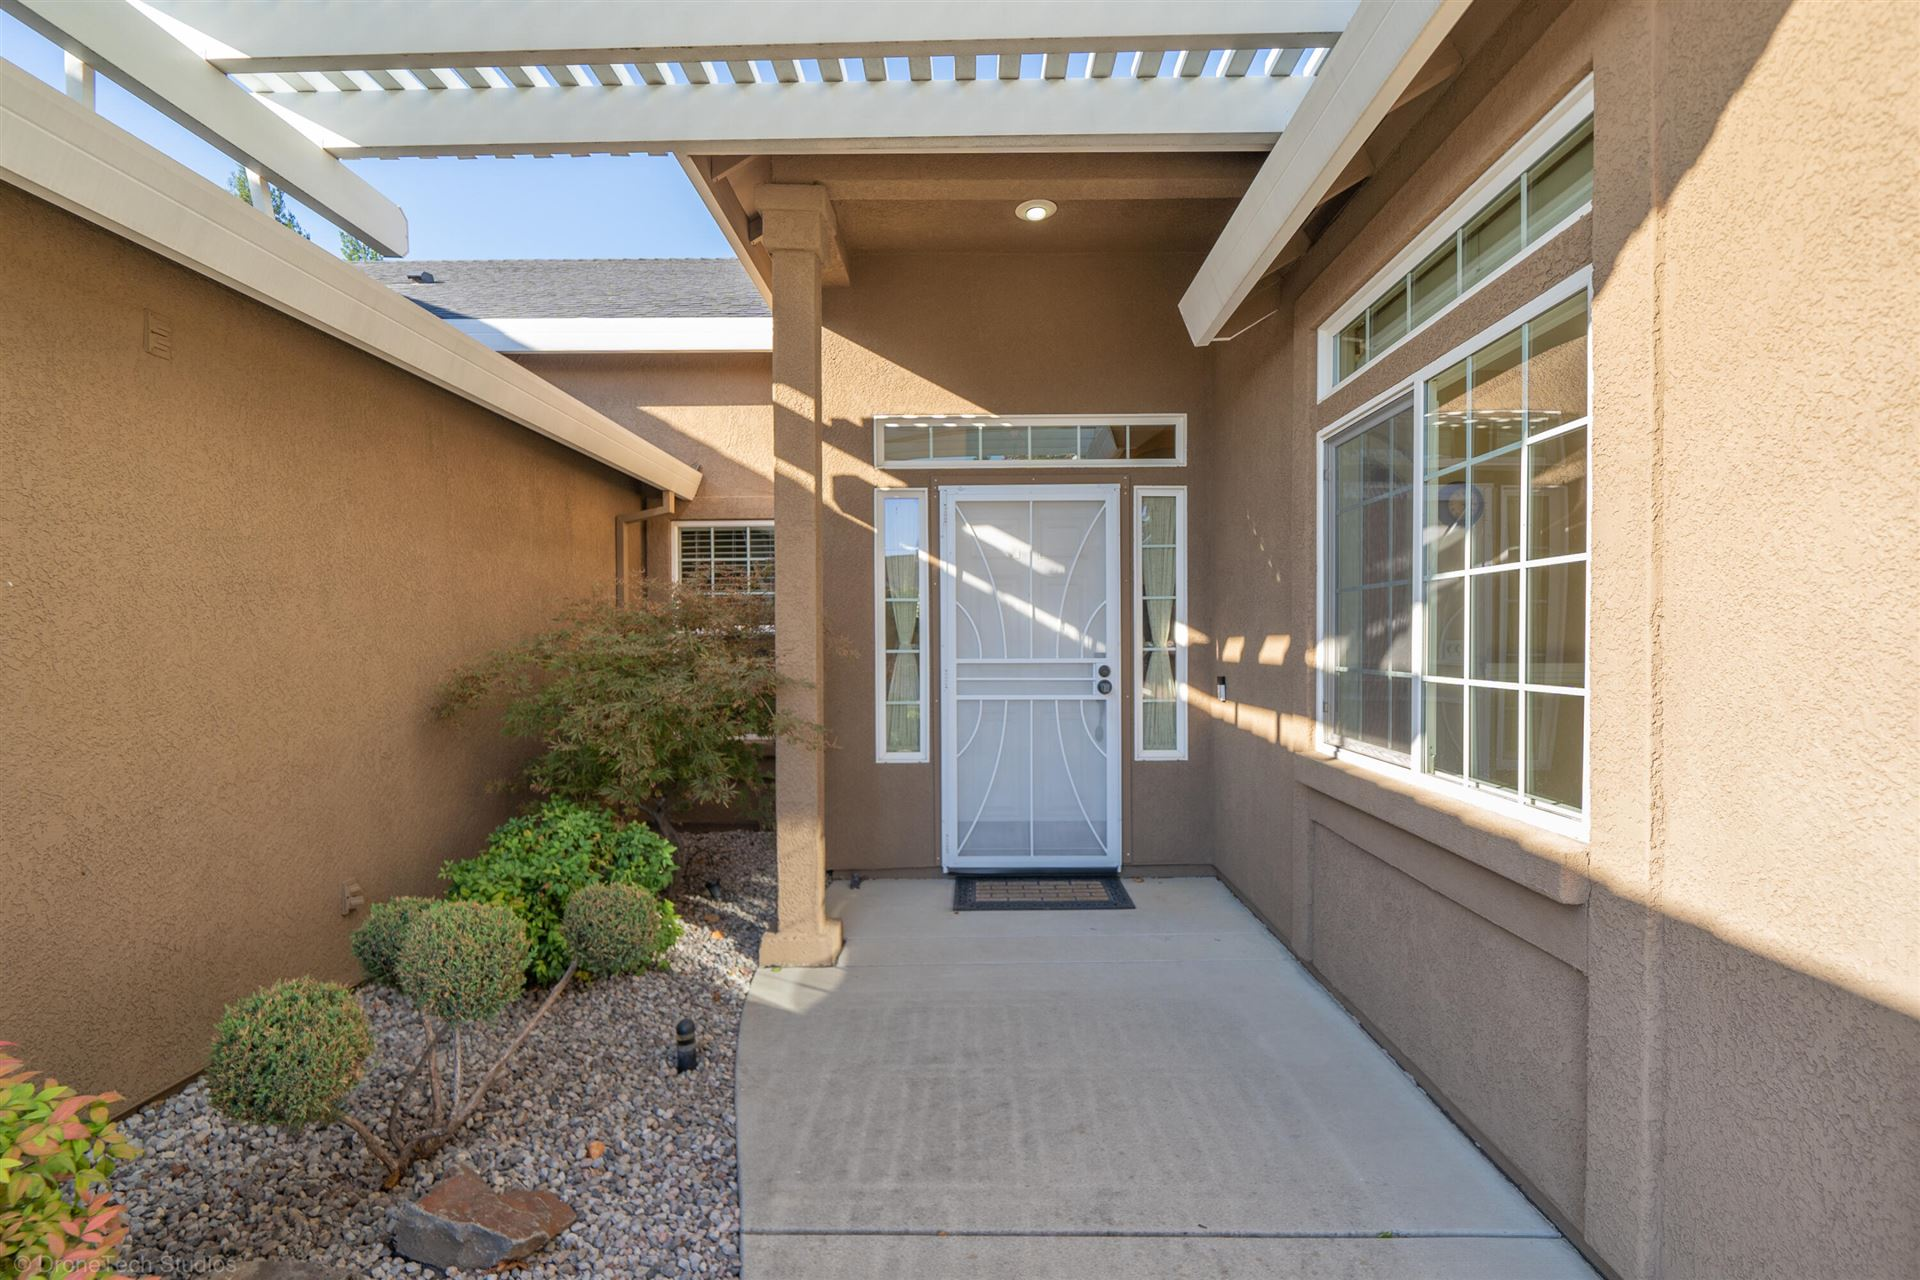 Photo of 2380 Warm Spring Ln, Redding, CA 96003 (MLS # 21-4843)